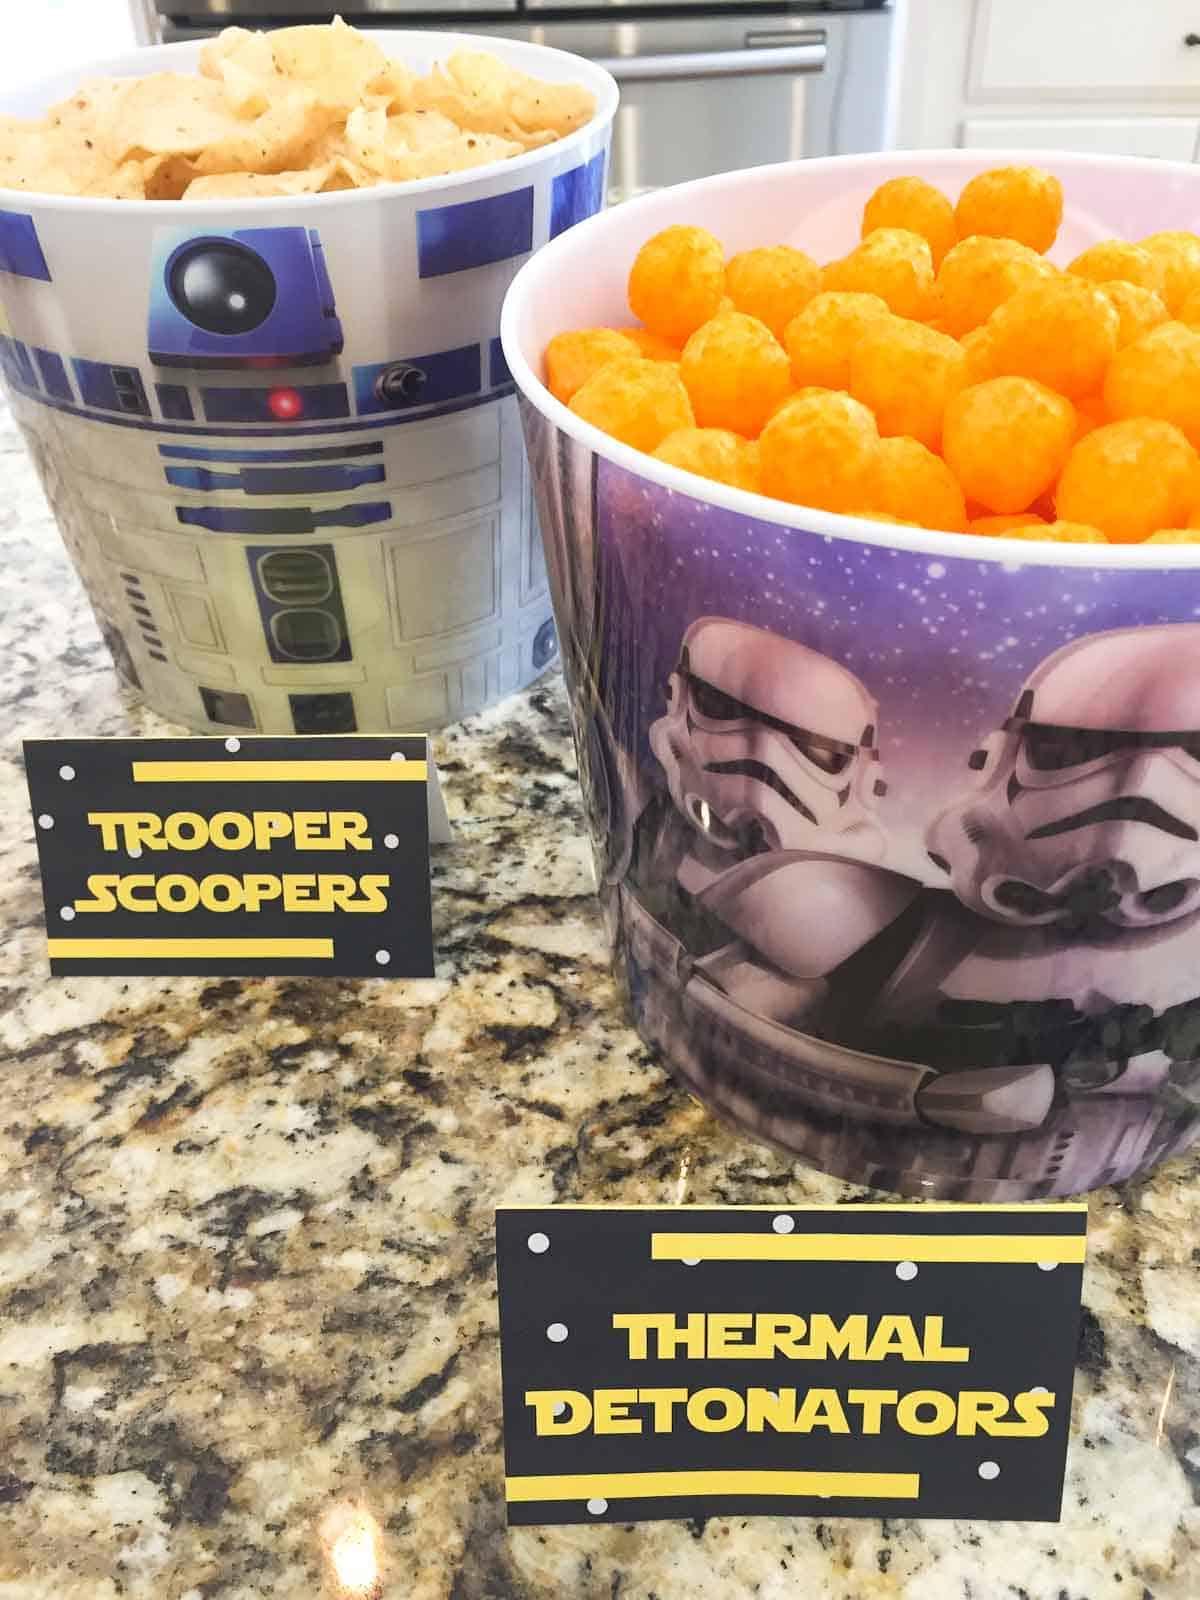 star wars recipes trooper scoopers and thermal detonators